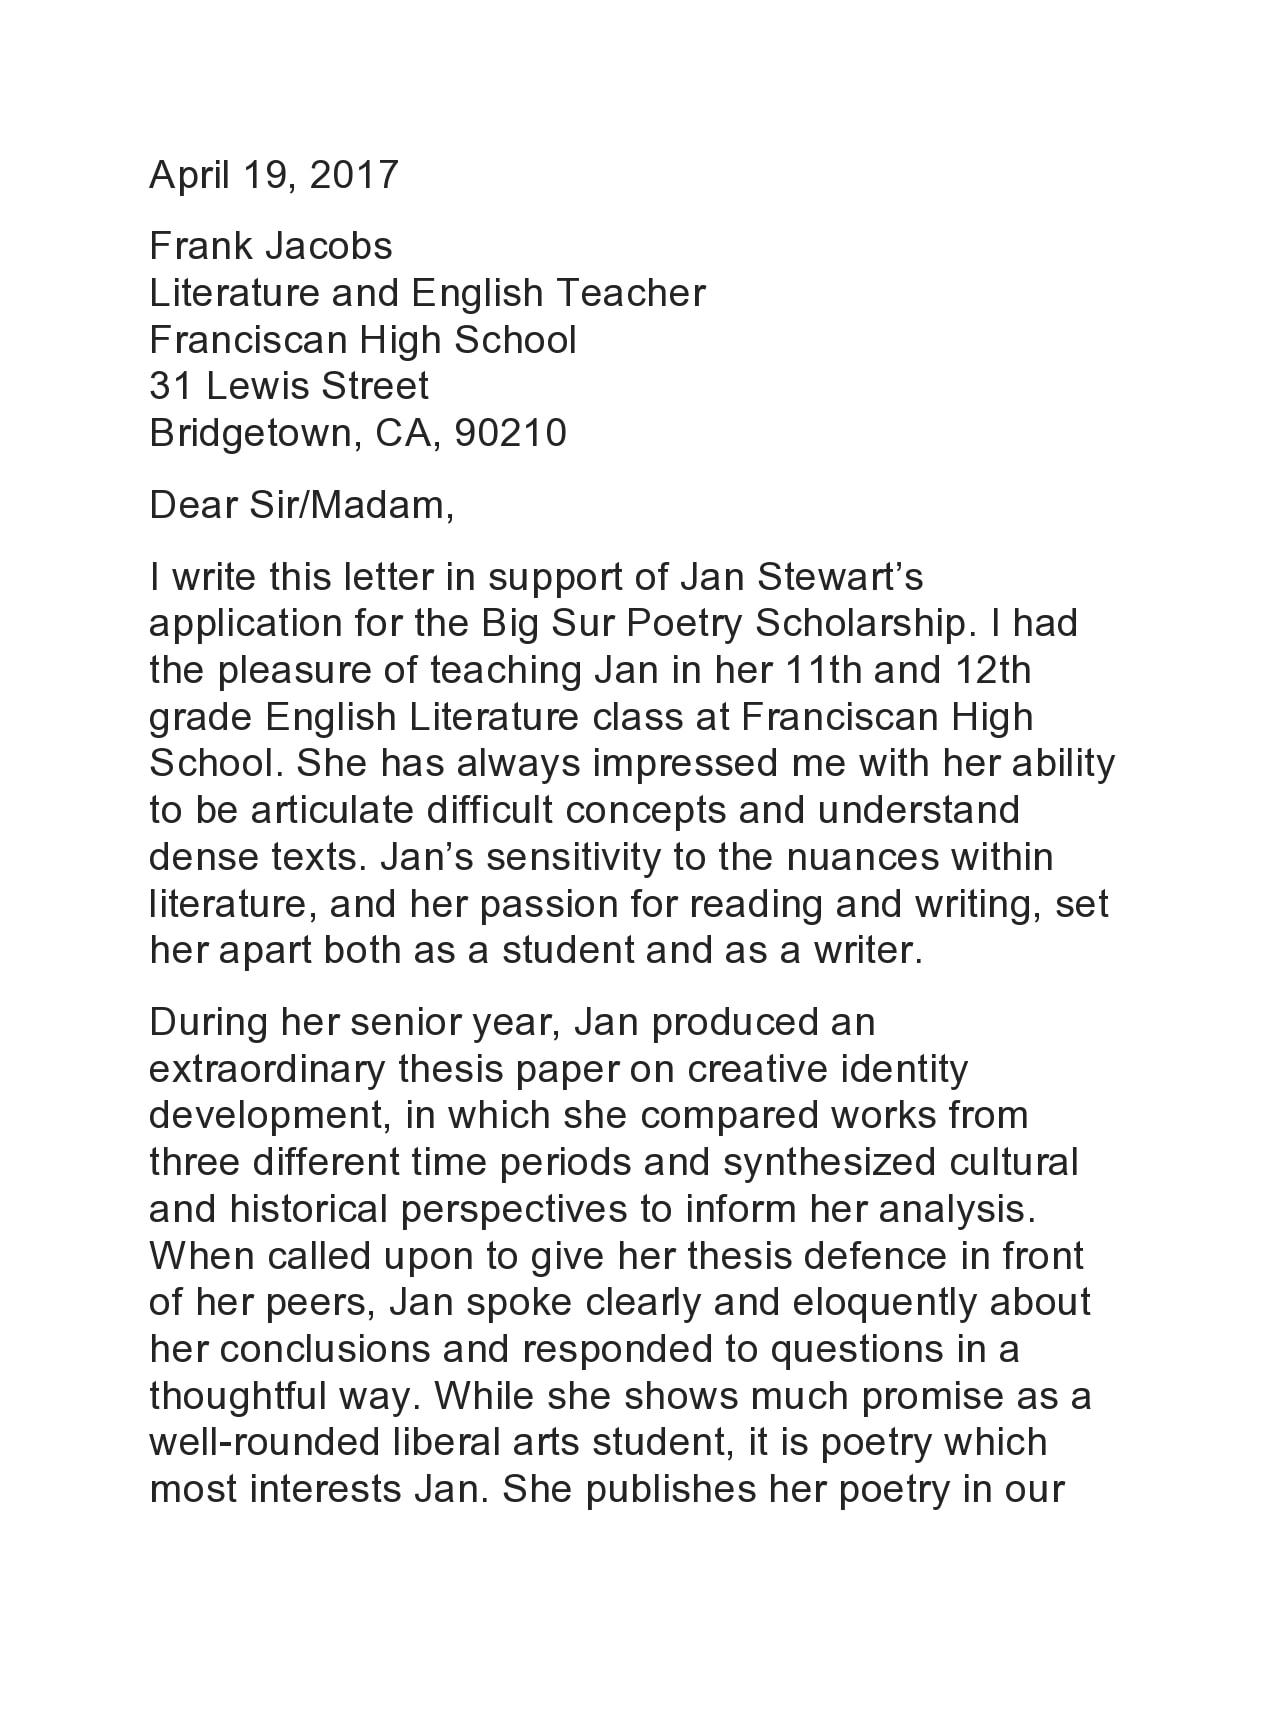 recommendation letter for scholarship 10